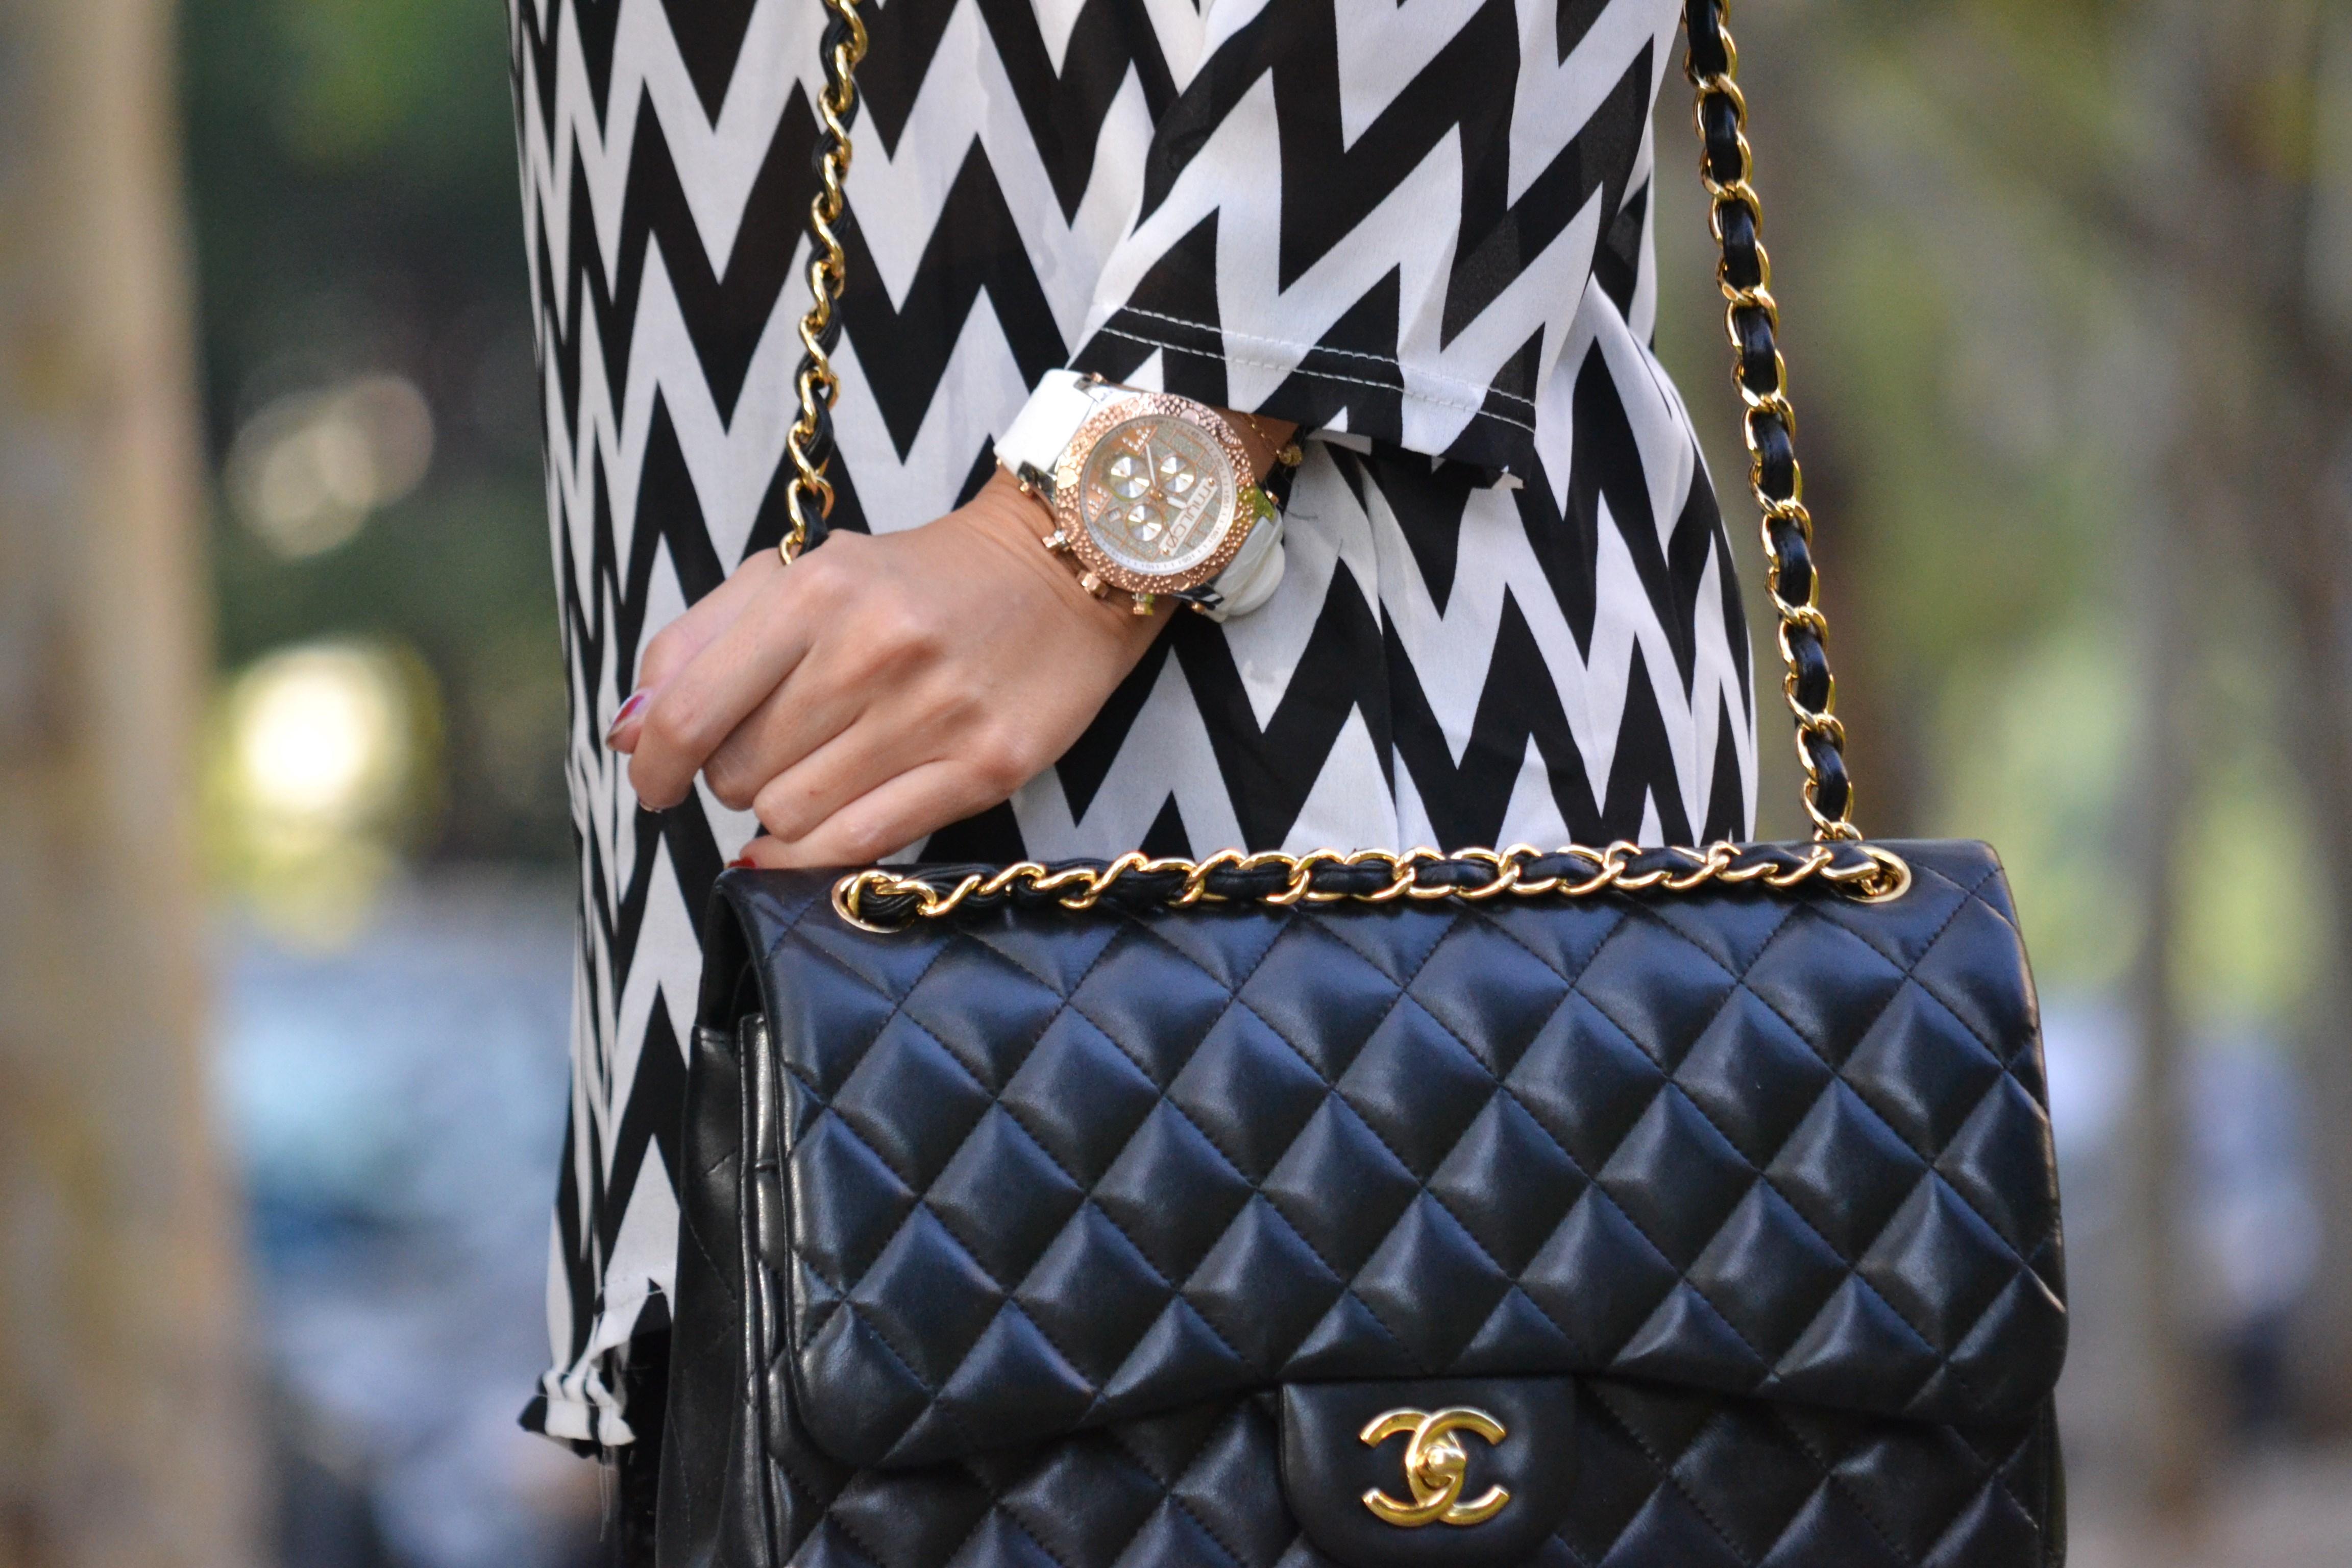 Mulco_Couture_UK_Jumbo_Chanel_Lara_Martin_Gilarranz_JustFab_Bymyheels (10)